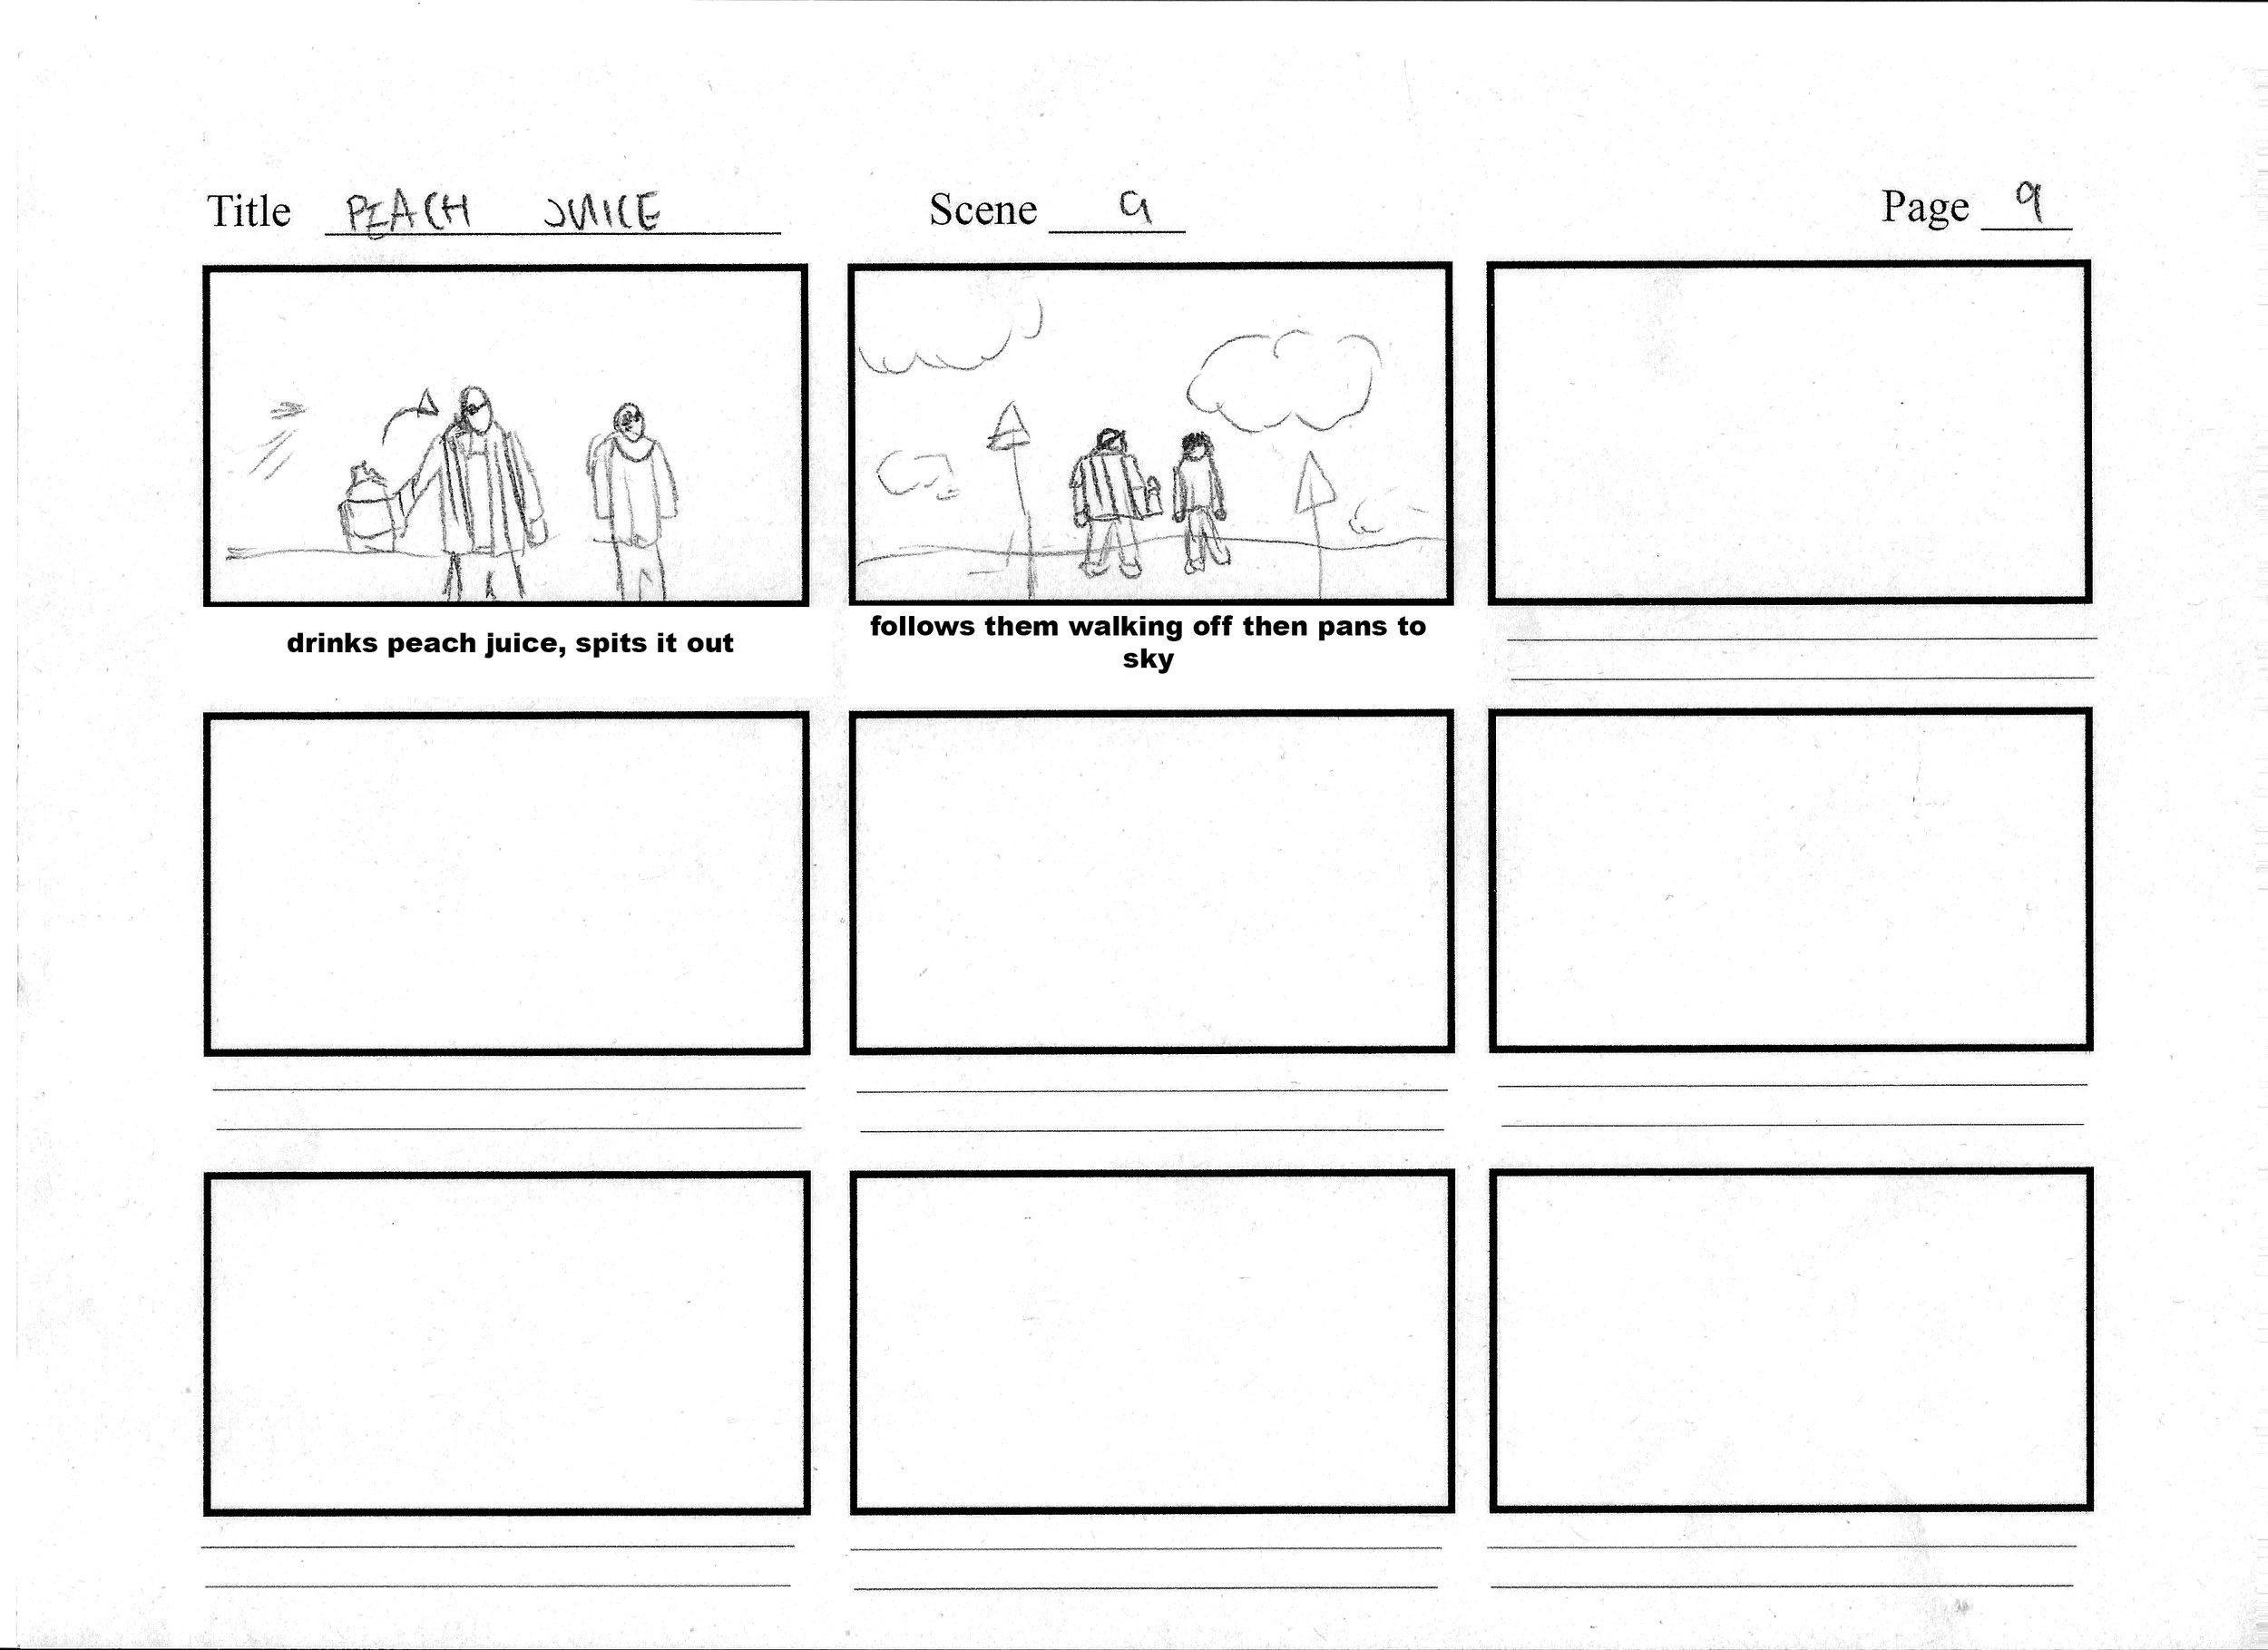 peace juice storyboard 9.jpg